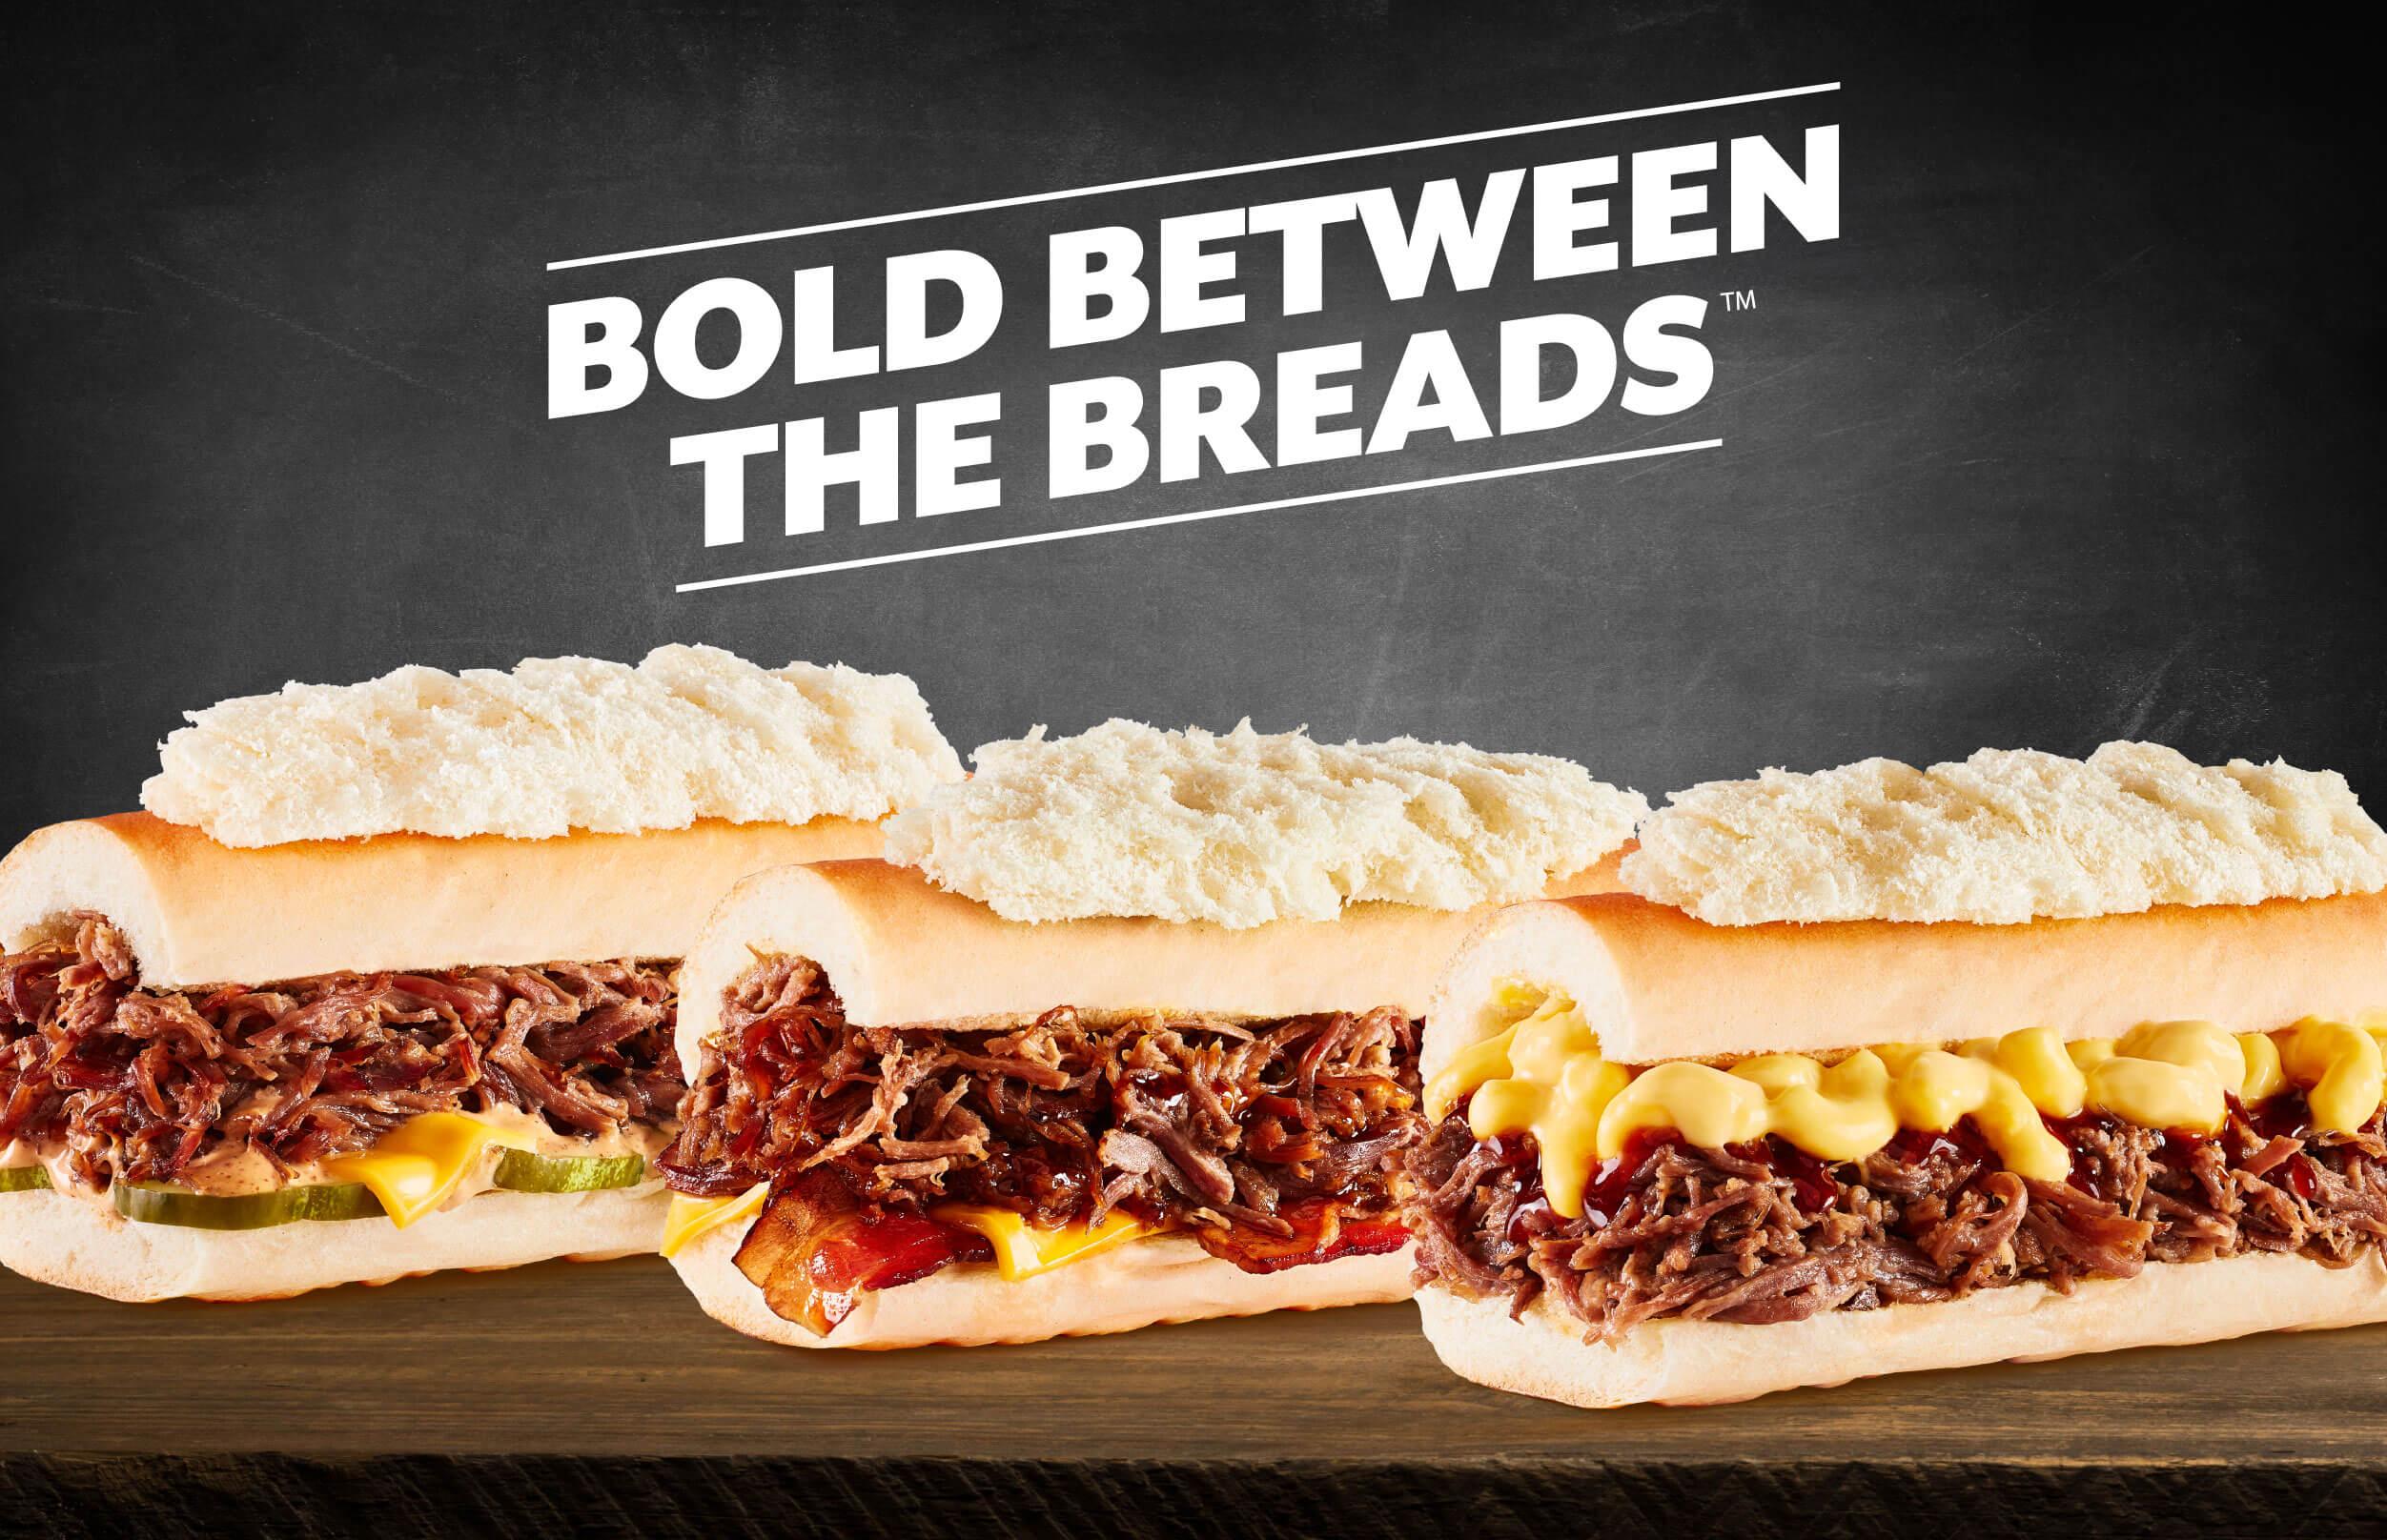 Erbert & Gerbert's Bold Between the Breads